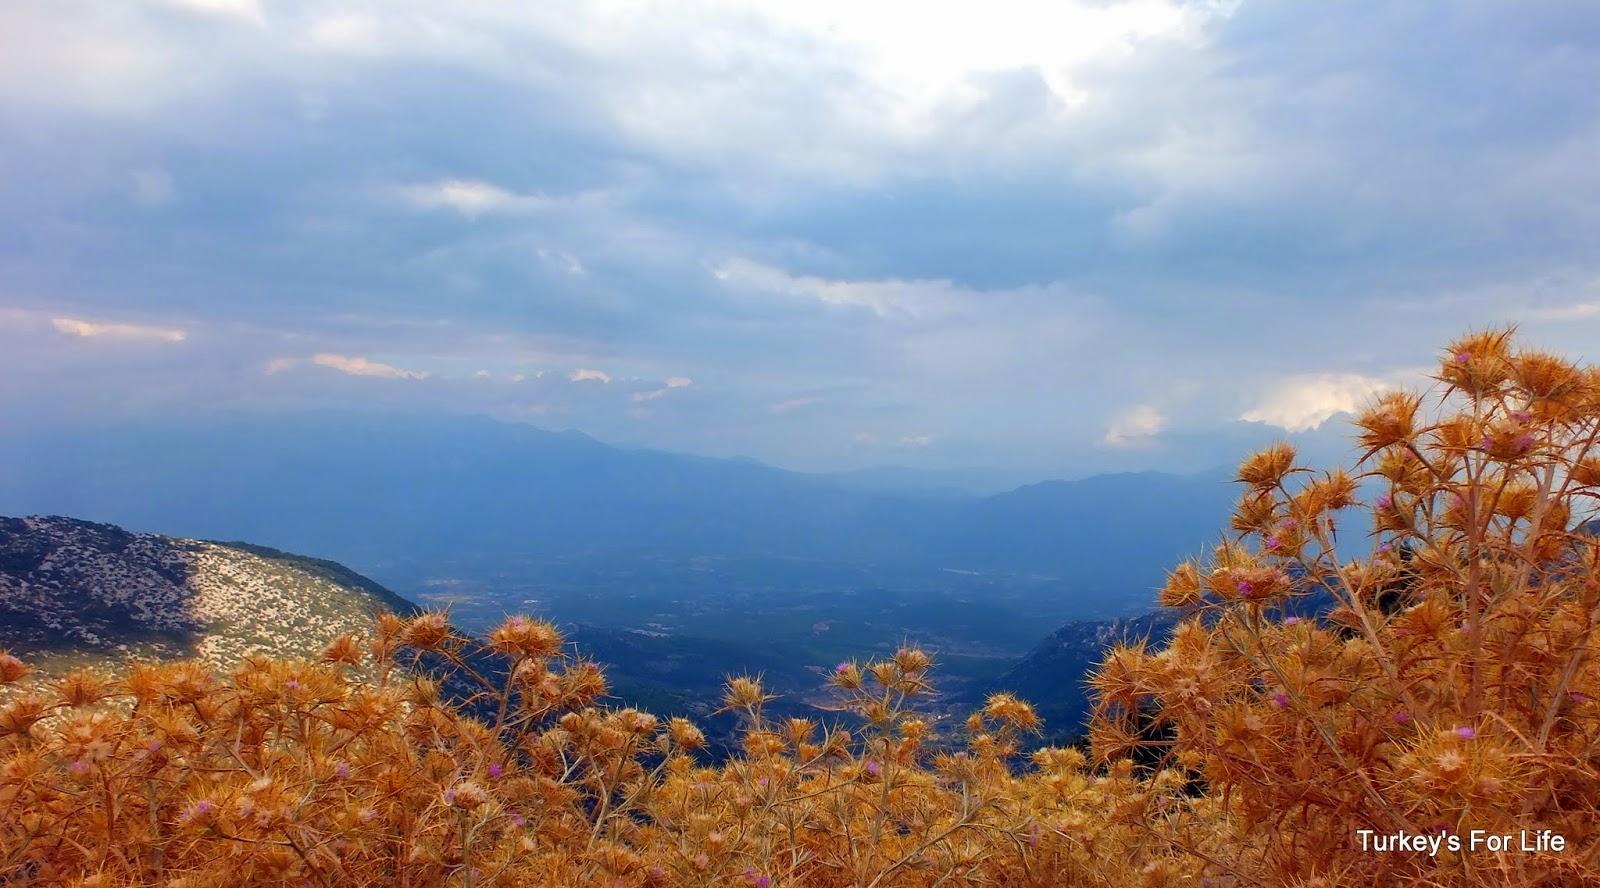 Xanthos Valley Views From Babadağ Mountain, Turkey